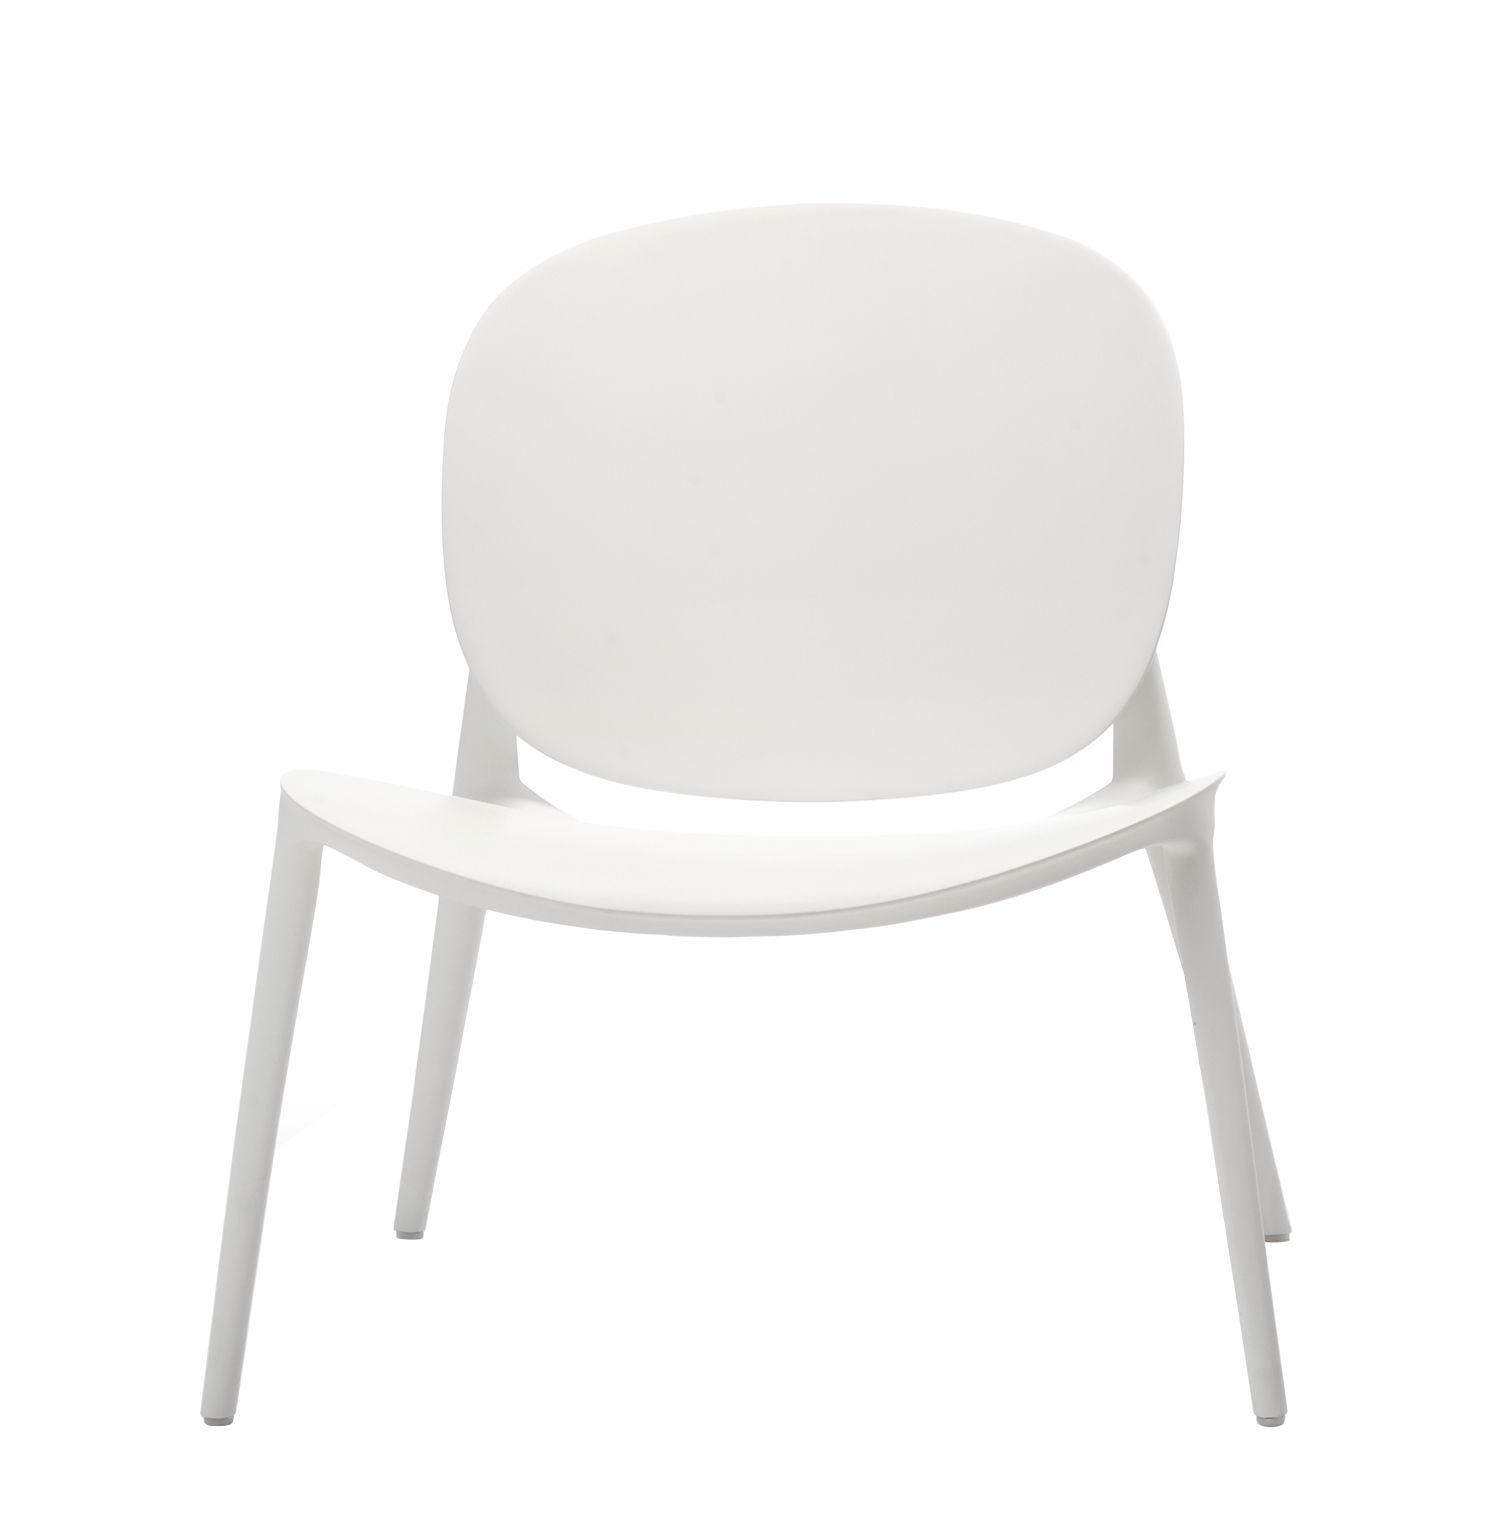 Möbel - Lounge Sessel - Be Bop Lounge Sessel / Outdoor - Kartell - Weiß - Polypropylen